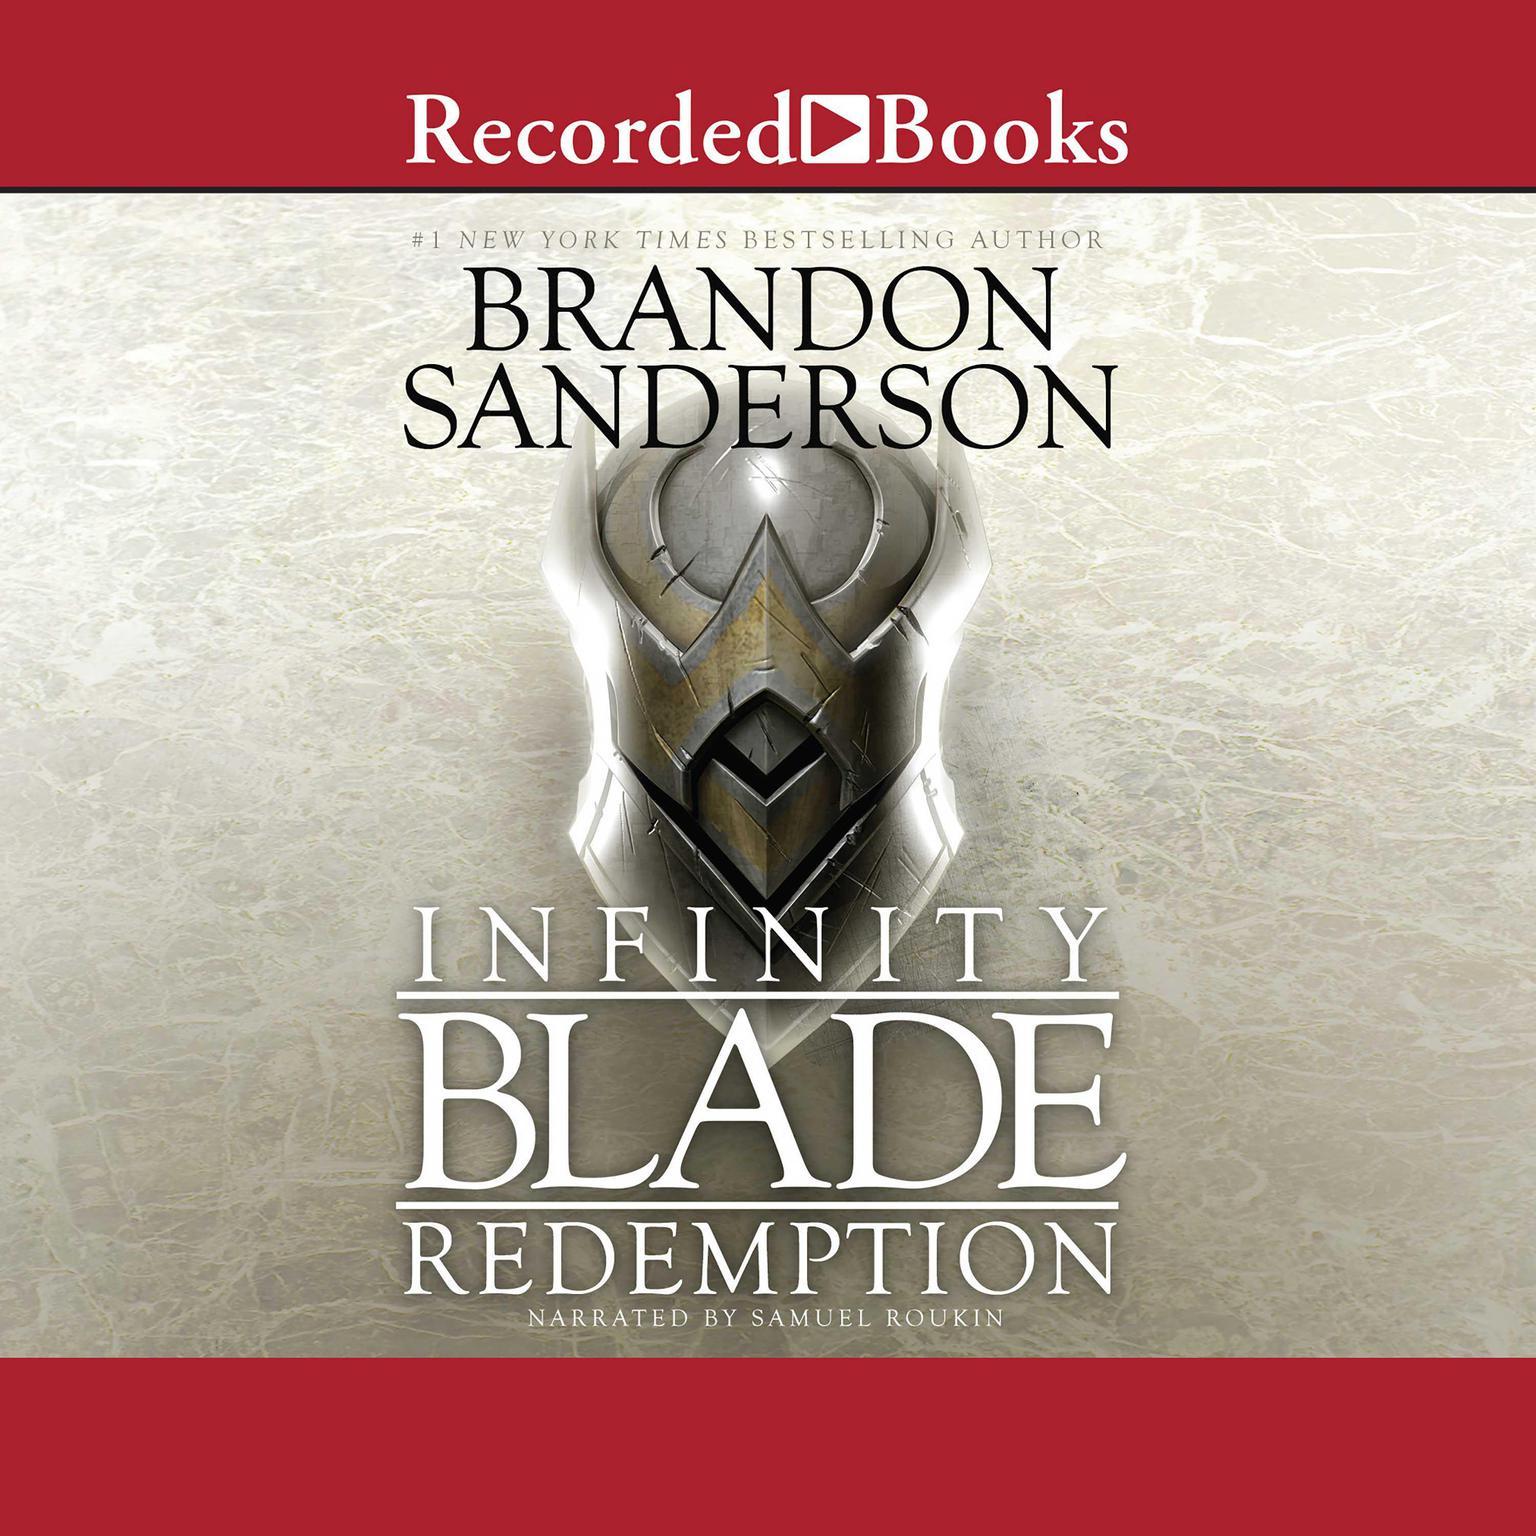 Infinity Blade: Redemption Audiobook, by Brandon Sanderson